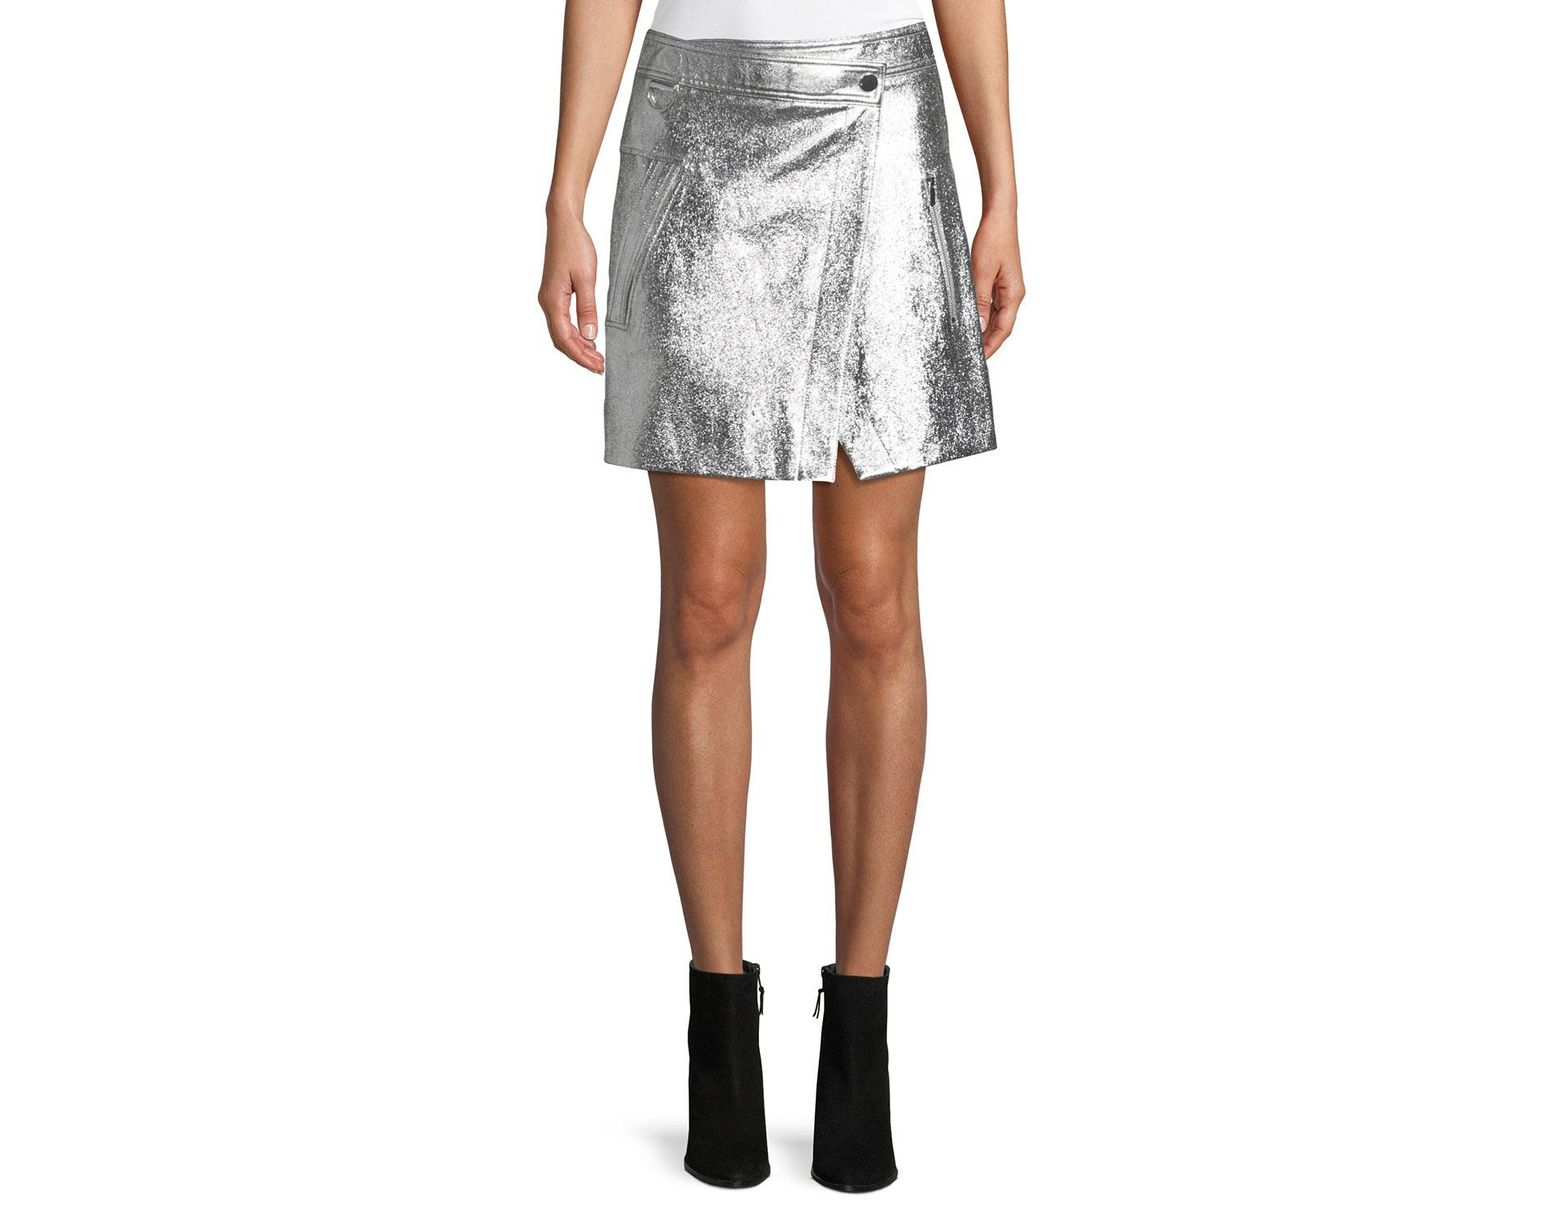 b8e8d5d25c24 Lyst - 10 Crosby Derek Lam Patent Leather Wrap Mini Skirt in Metallic